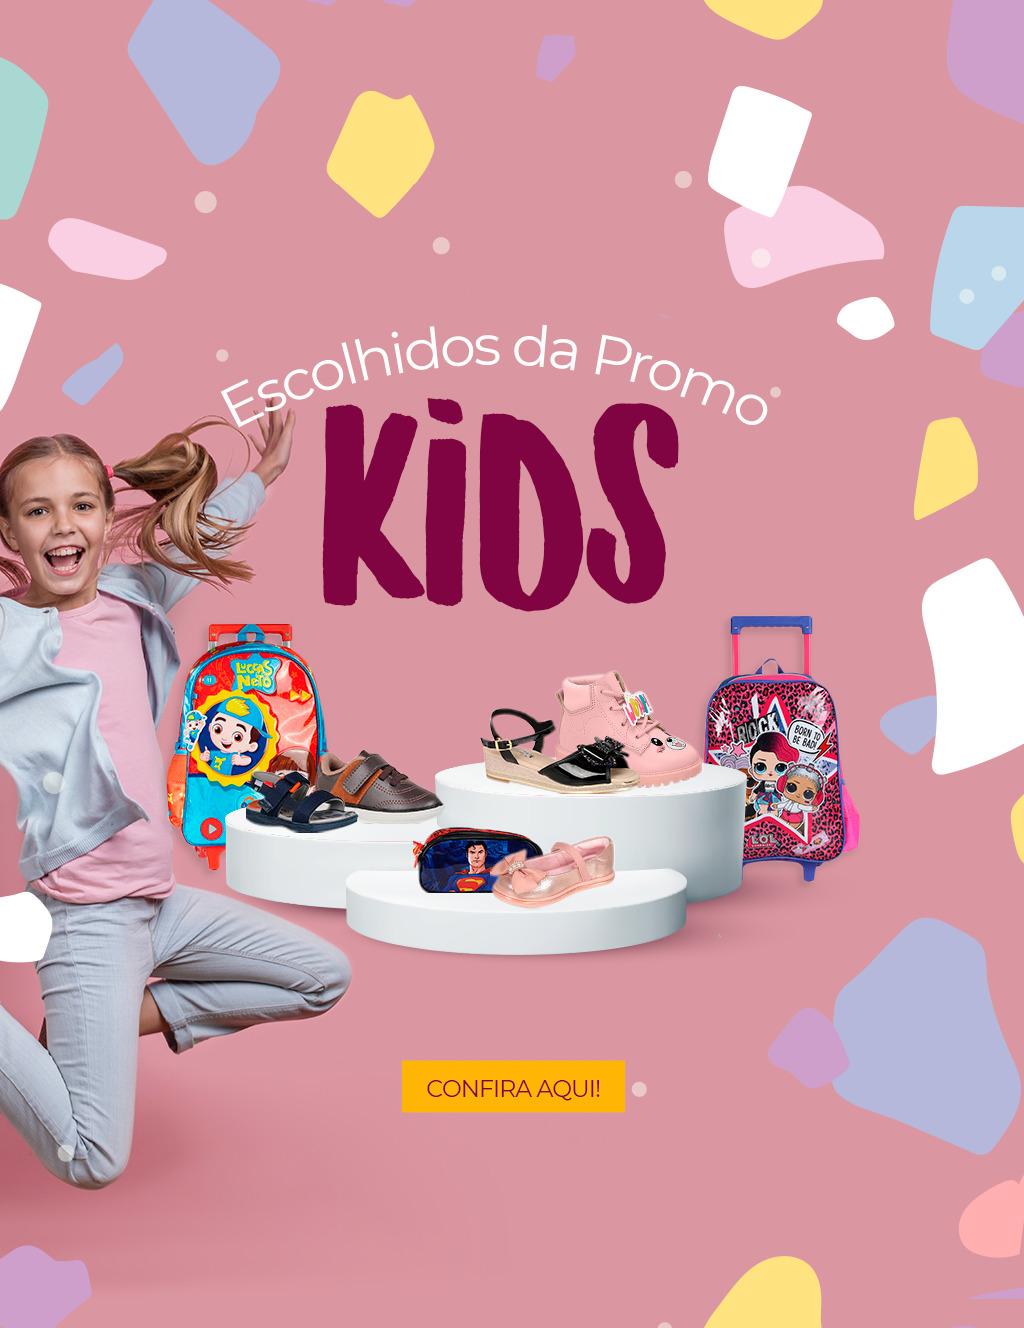 Escolhidos da Promo Kids